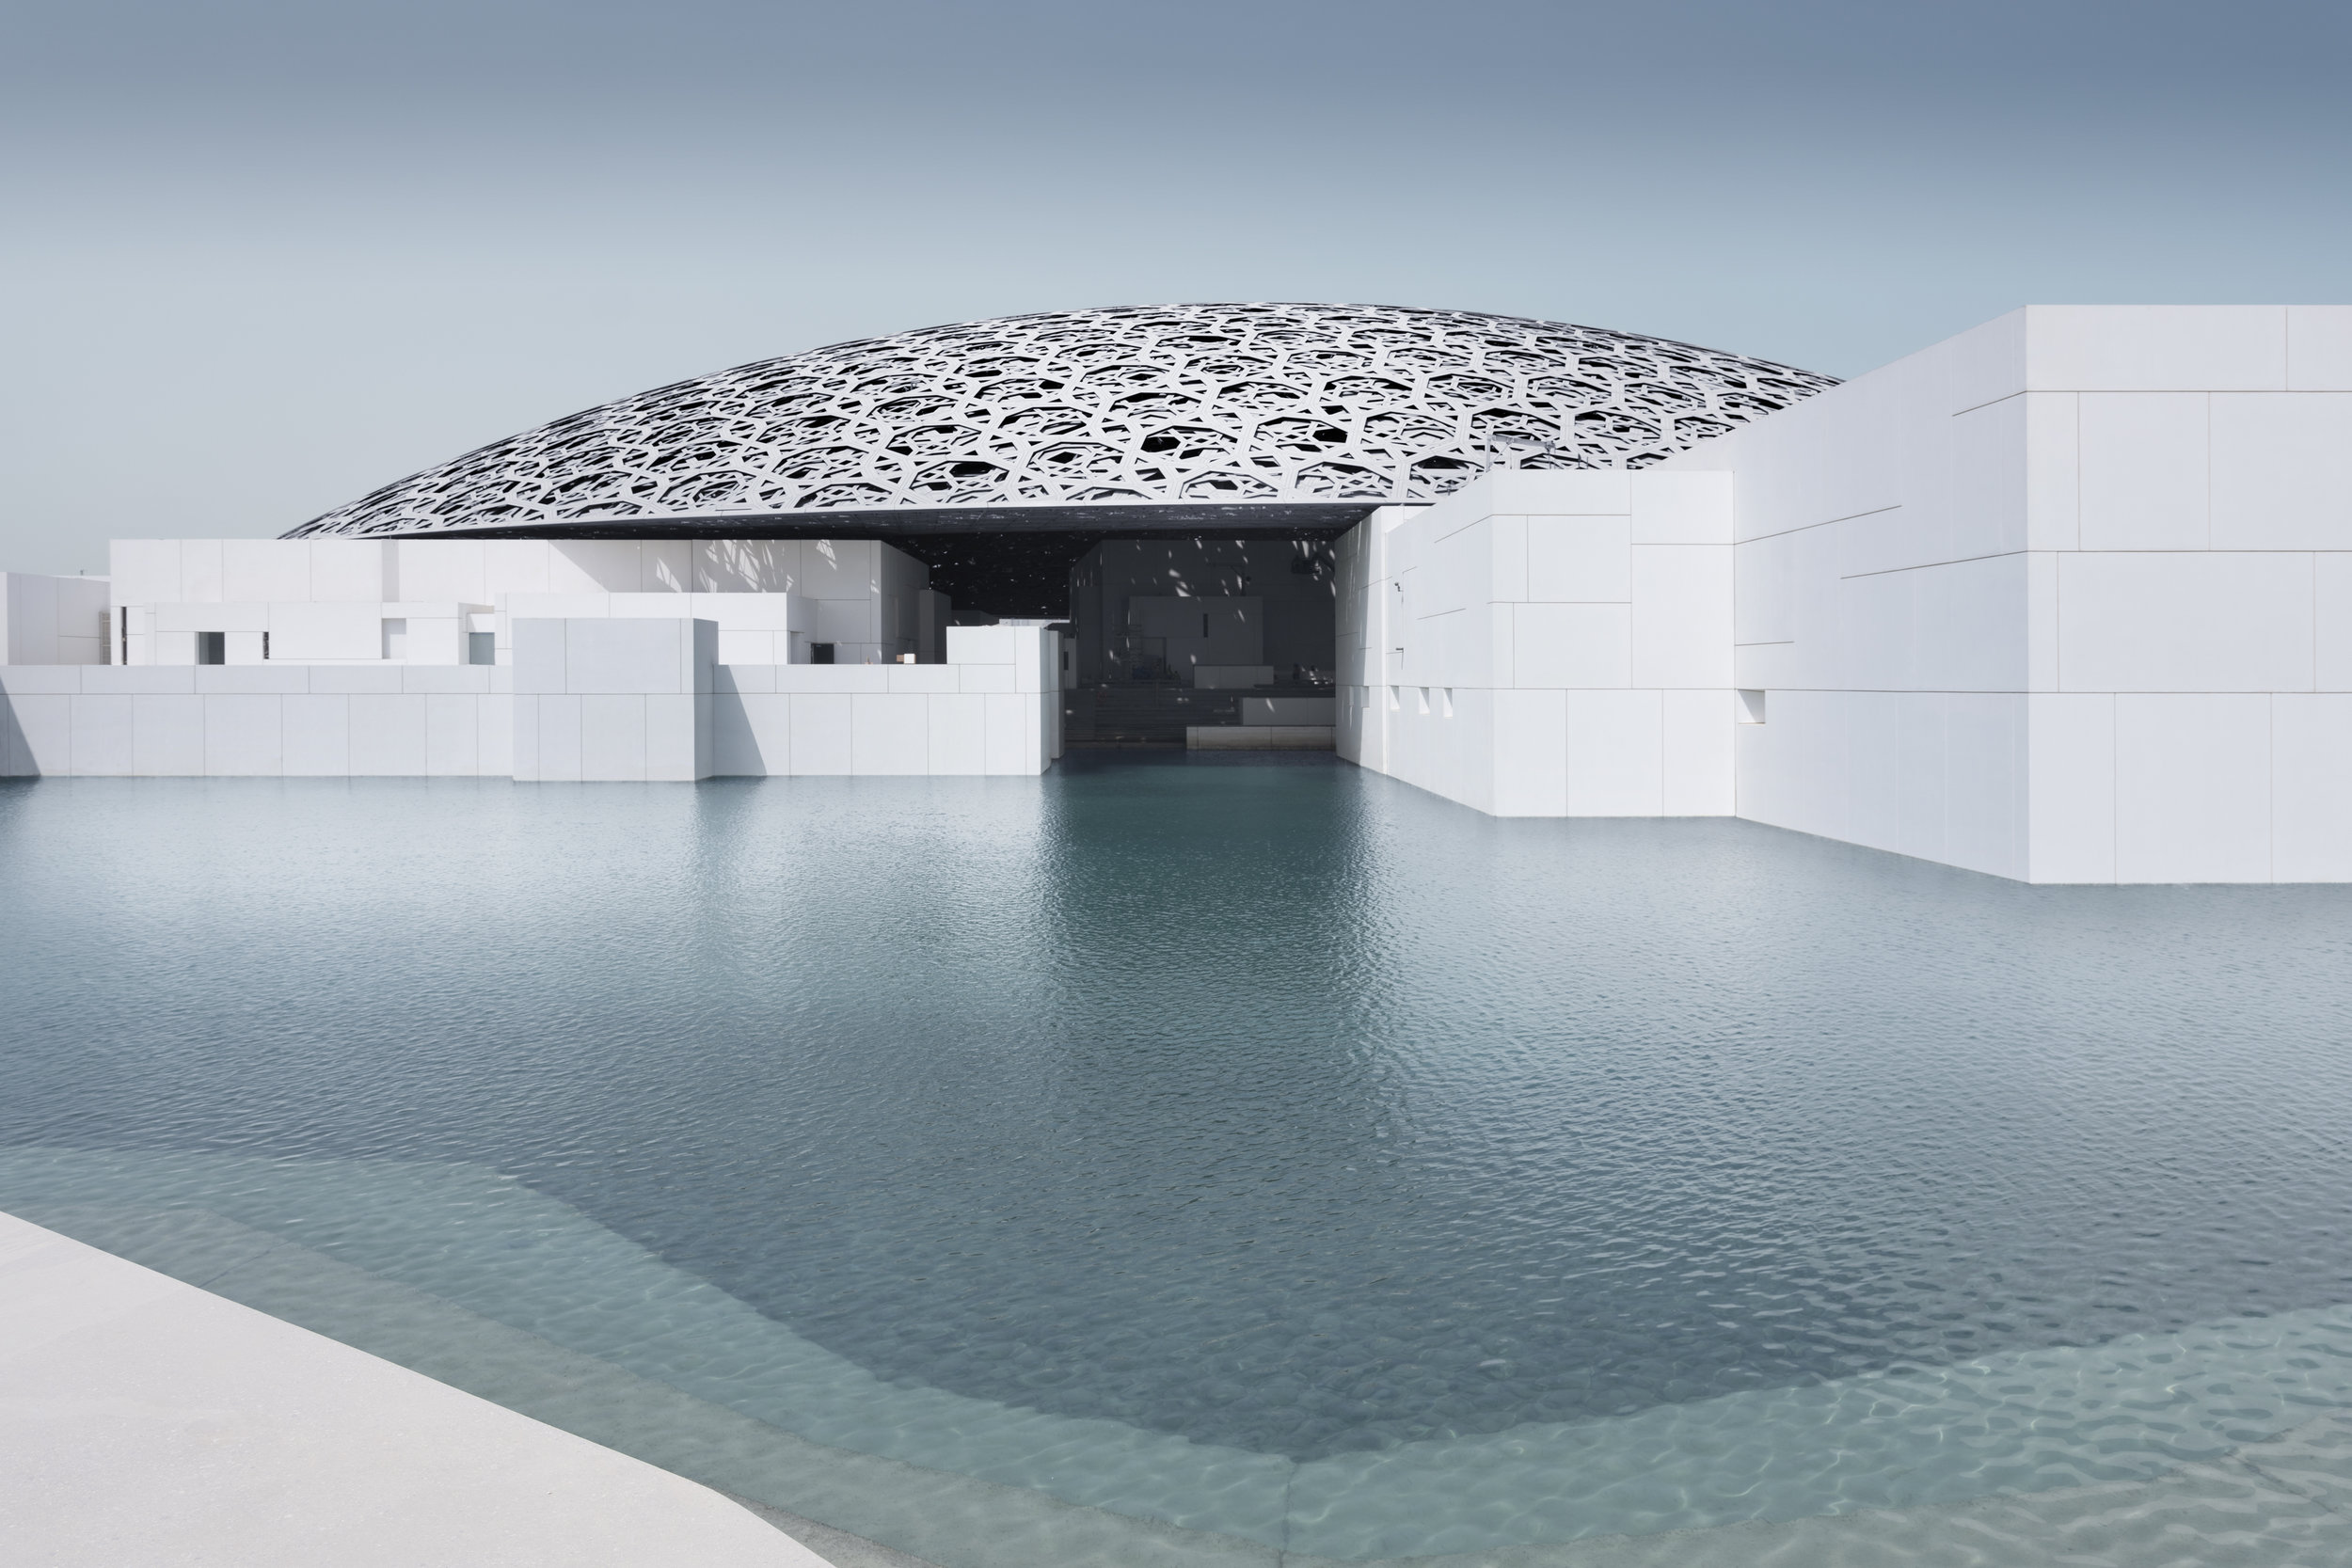 Louvre Abu Dhabi's exterior © Louvre Abu Dhabi, Photography: Mohamed Somji